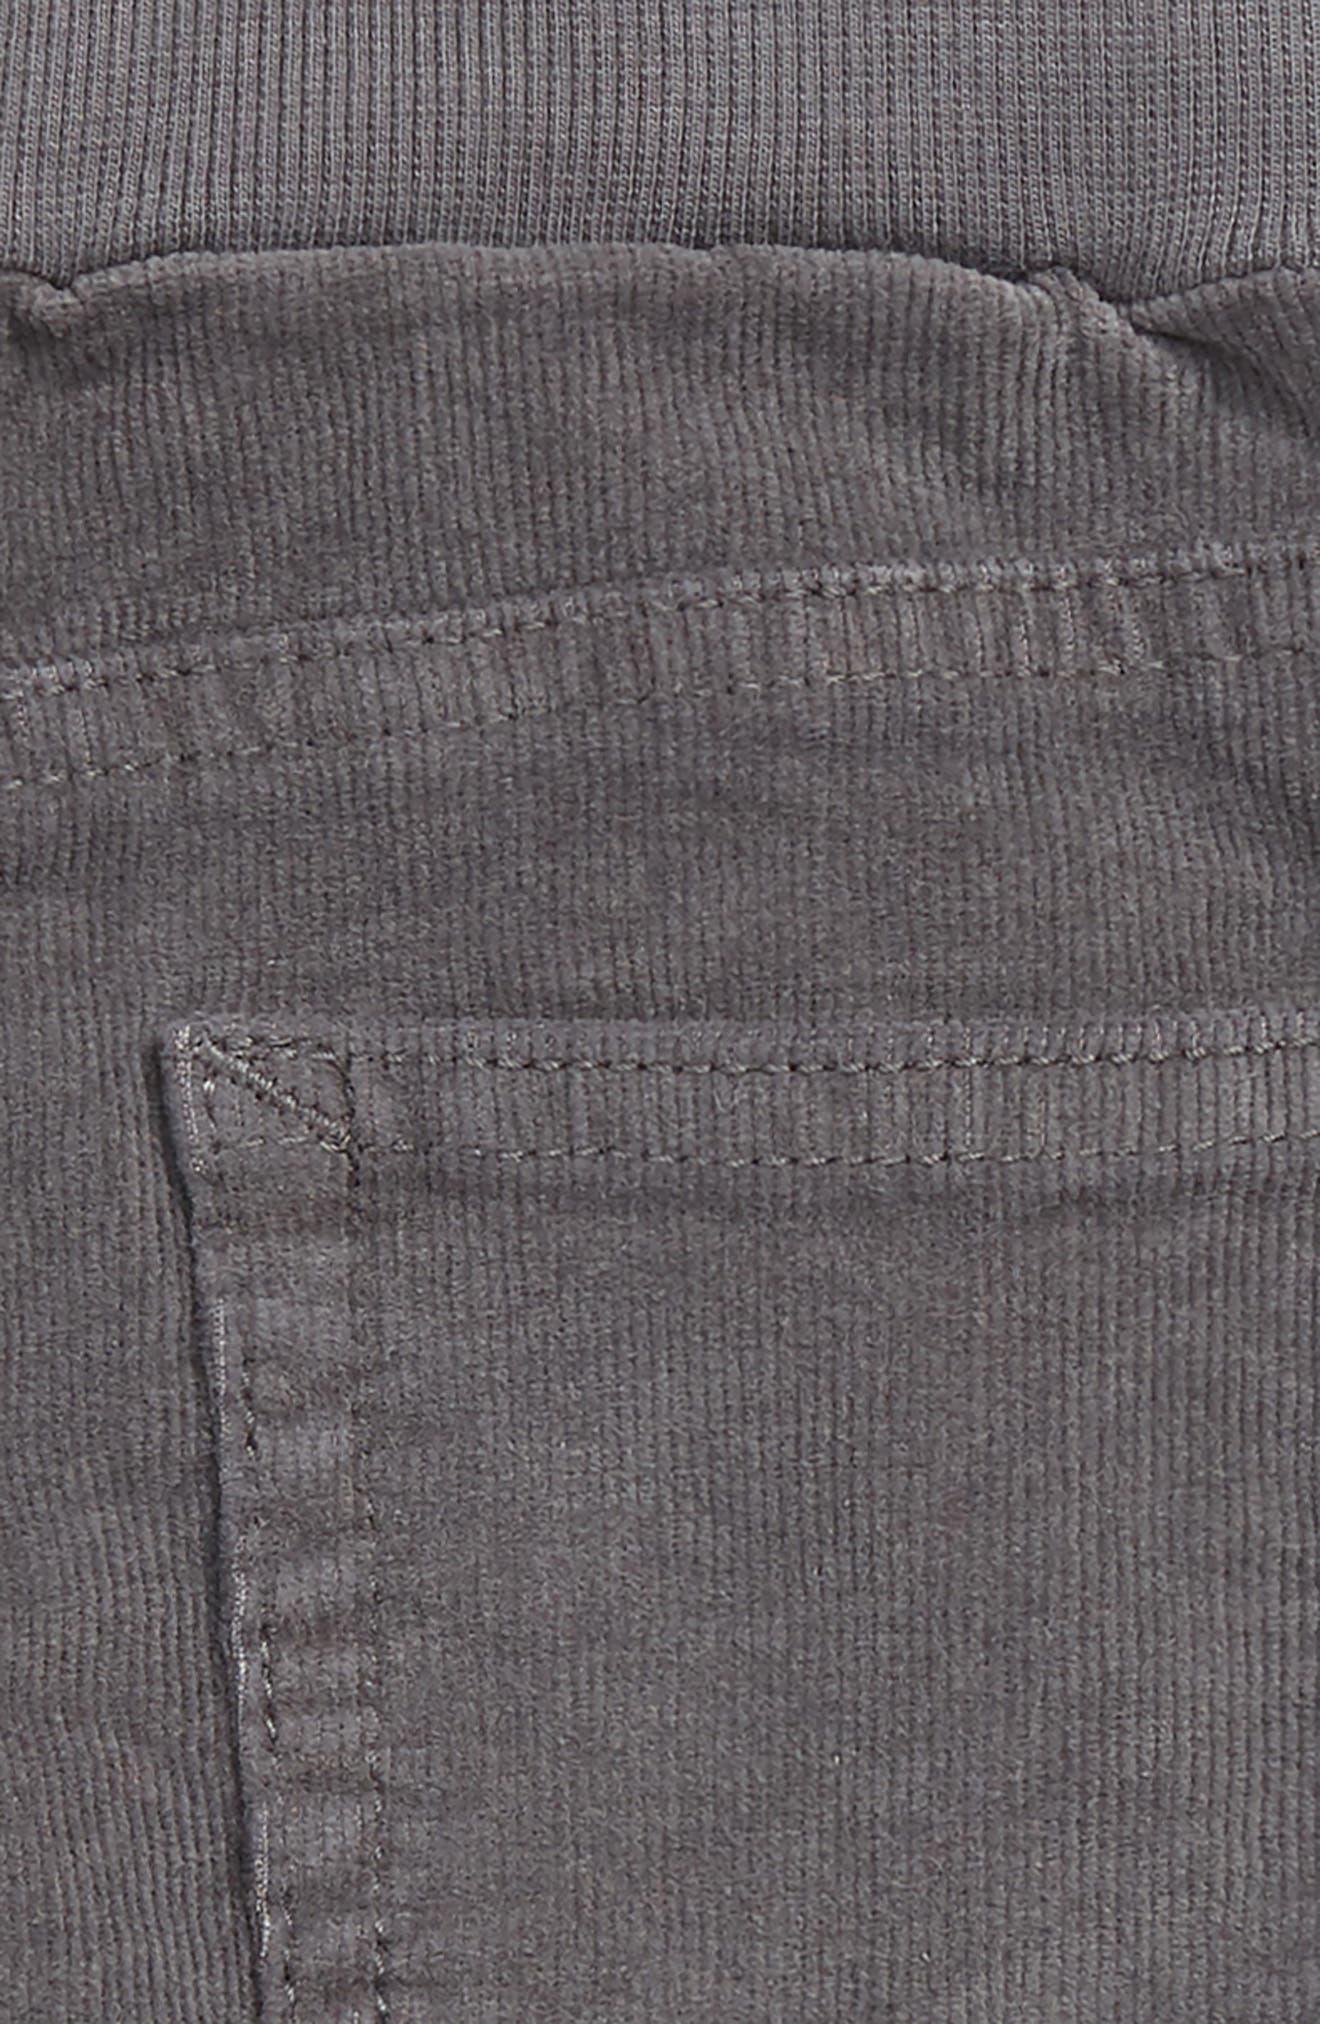 TUCKER + TATE,                             Corduroy Pants,                             Alternate thumbnail 3, color,                             GREY CASTLEROCK